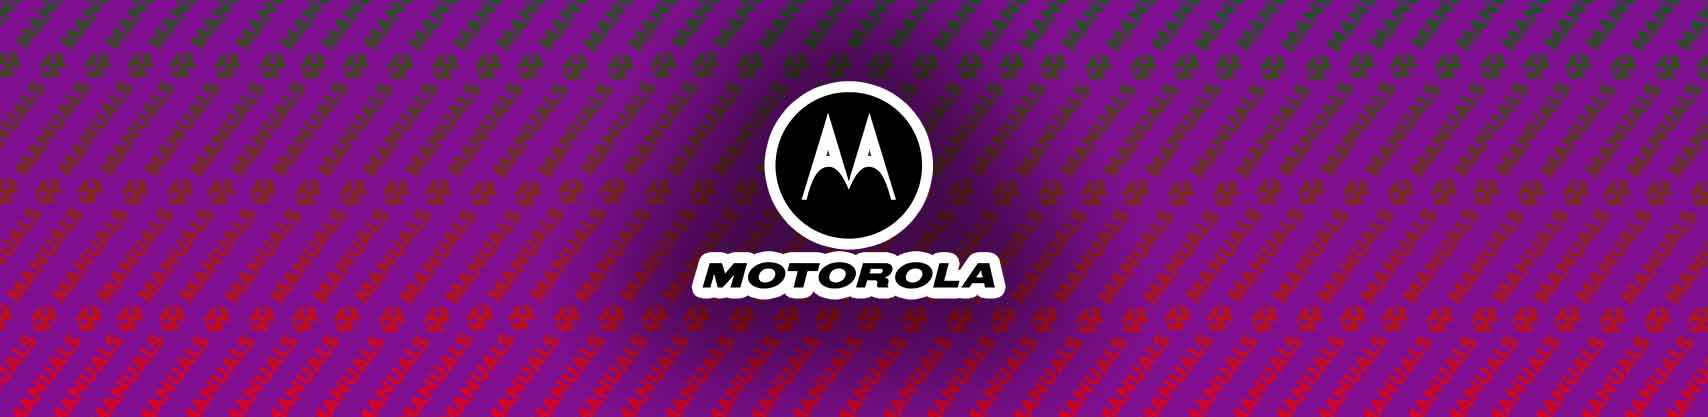 Motorola G 3rd Generation Manual